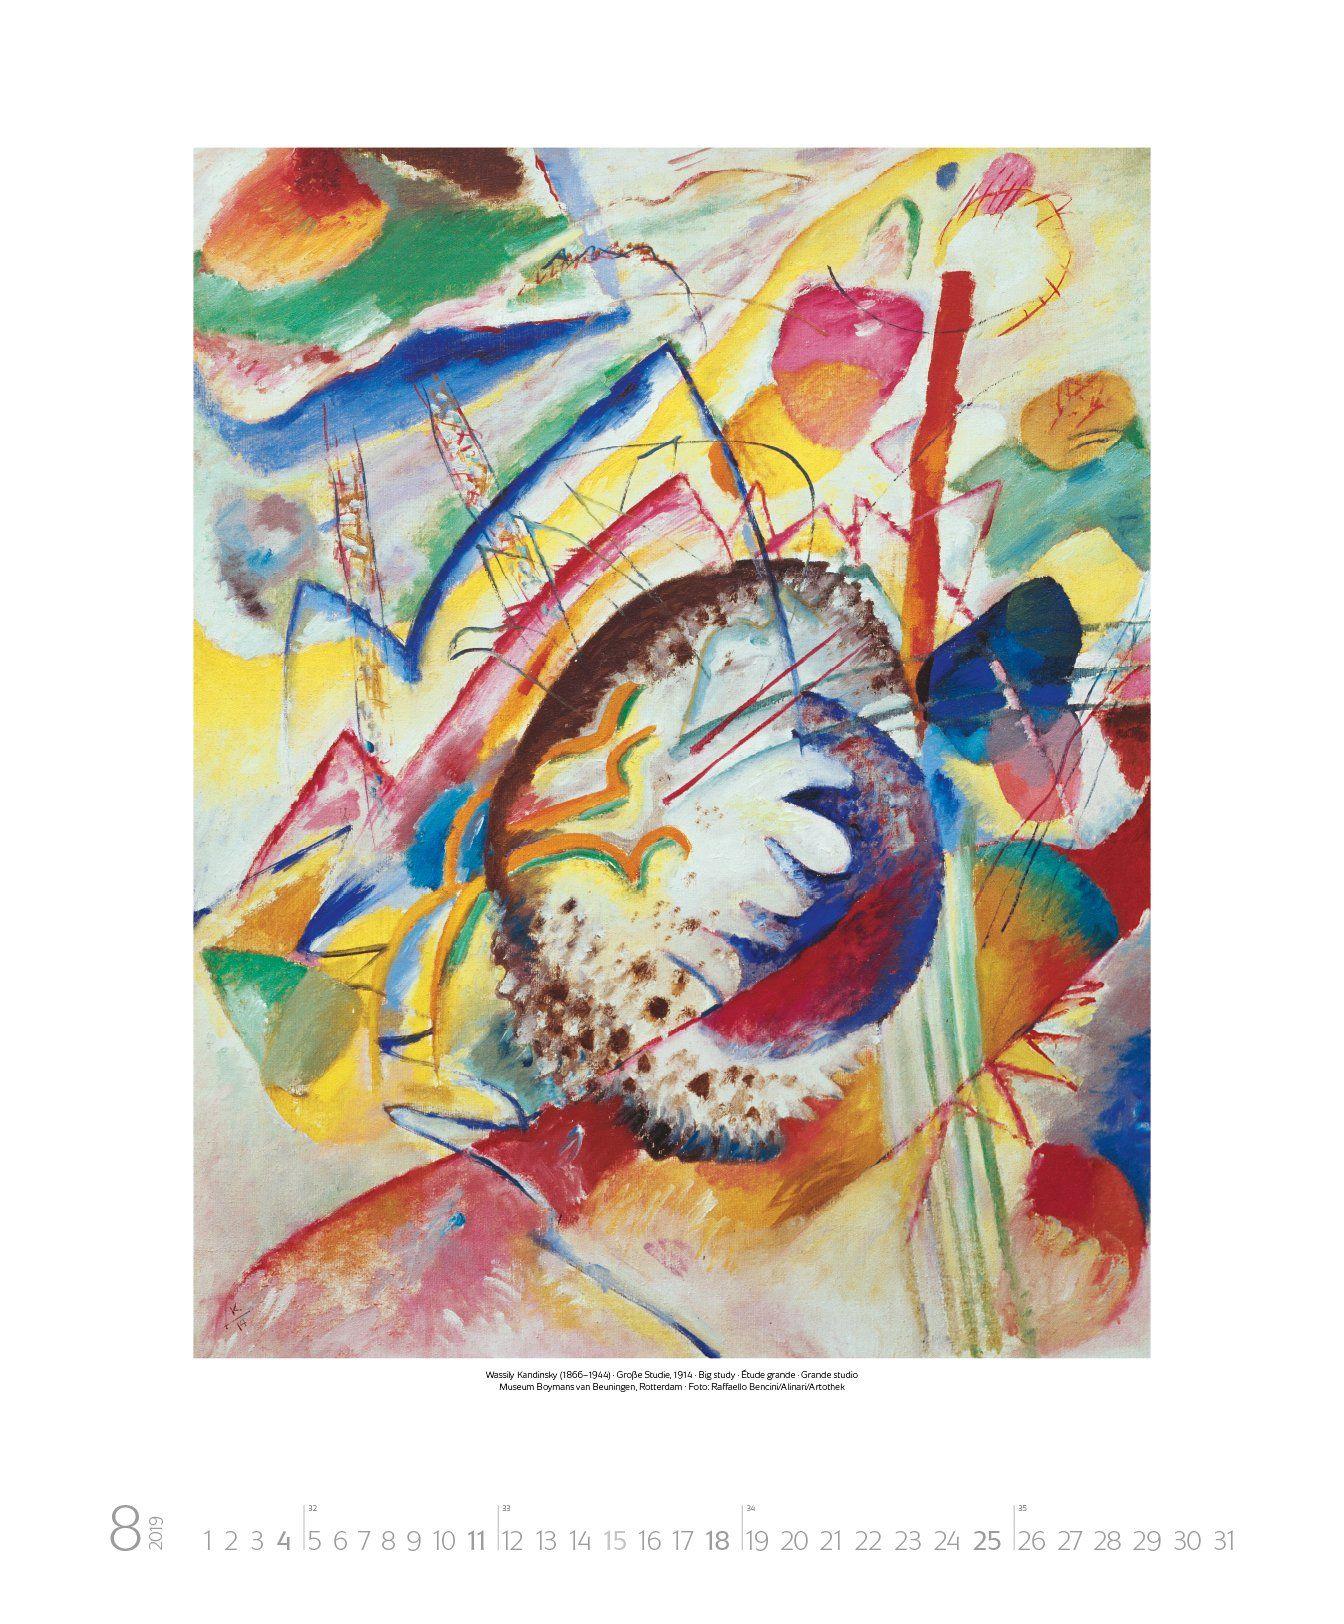 Wassily Kandinsky 2019 Kunst Art Kalender Kandinsky Wassily Kalender Art Wassily Kandinsky Kandinsky E Kunst